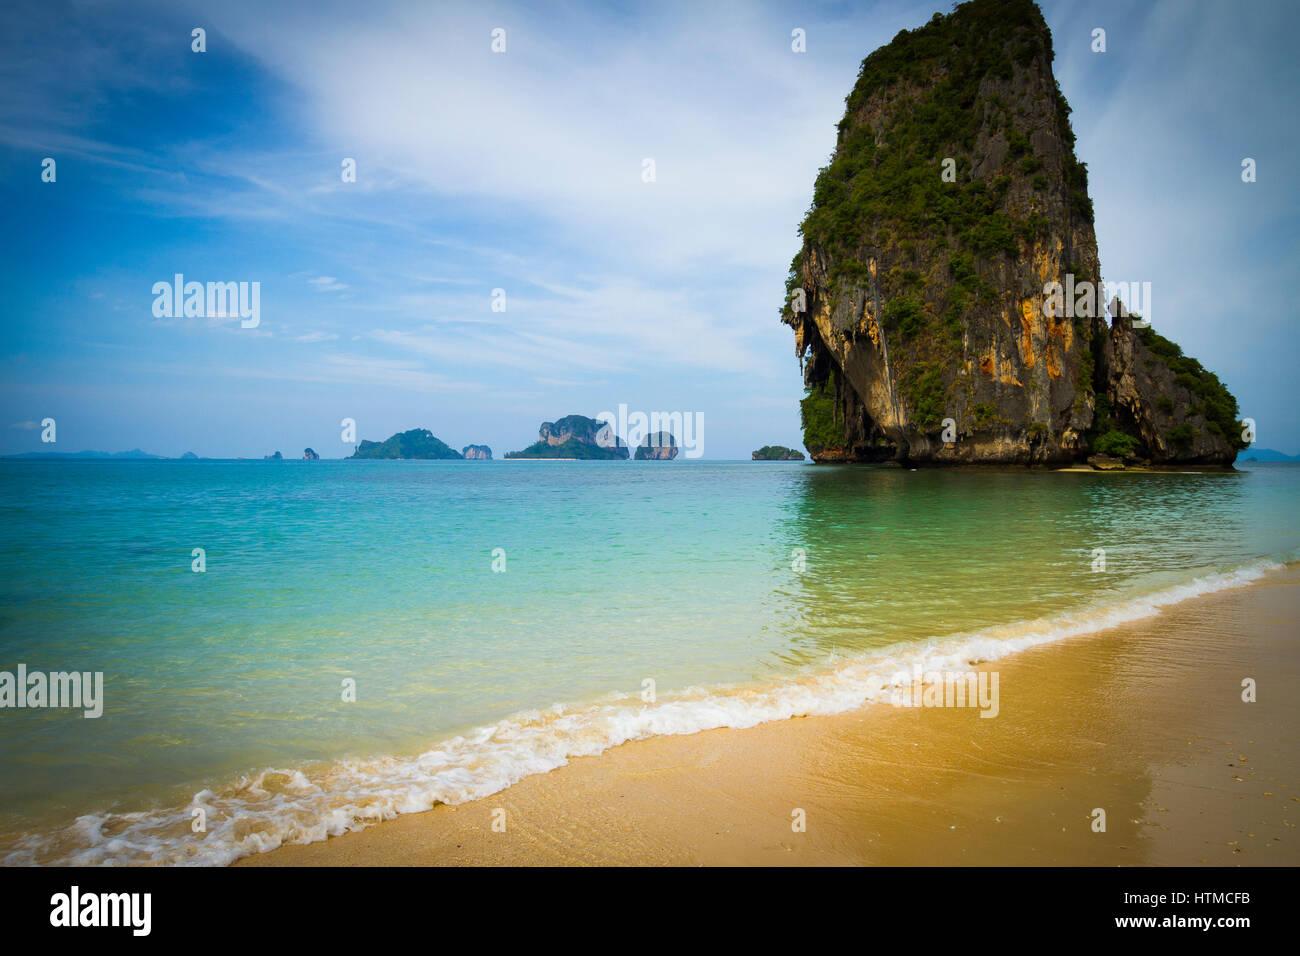 Koh Nok island and Pranang Cave Beach. Railay. Krabi province, Thailand. - Stock Image